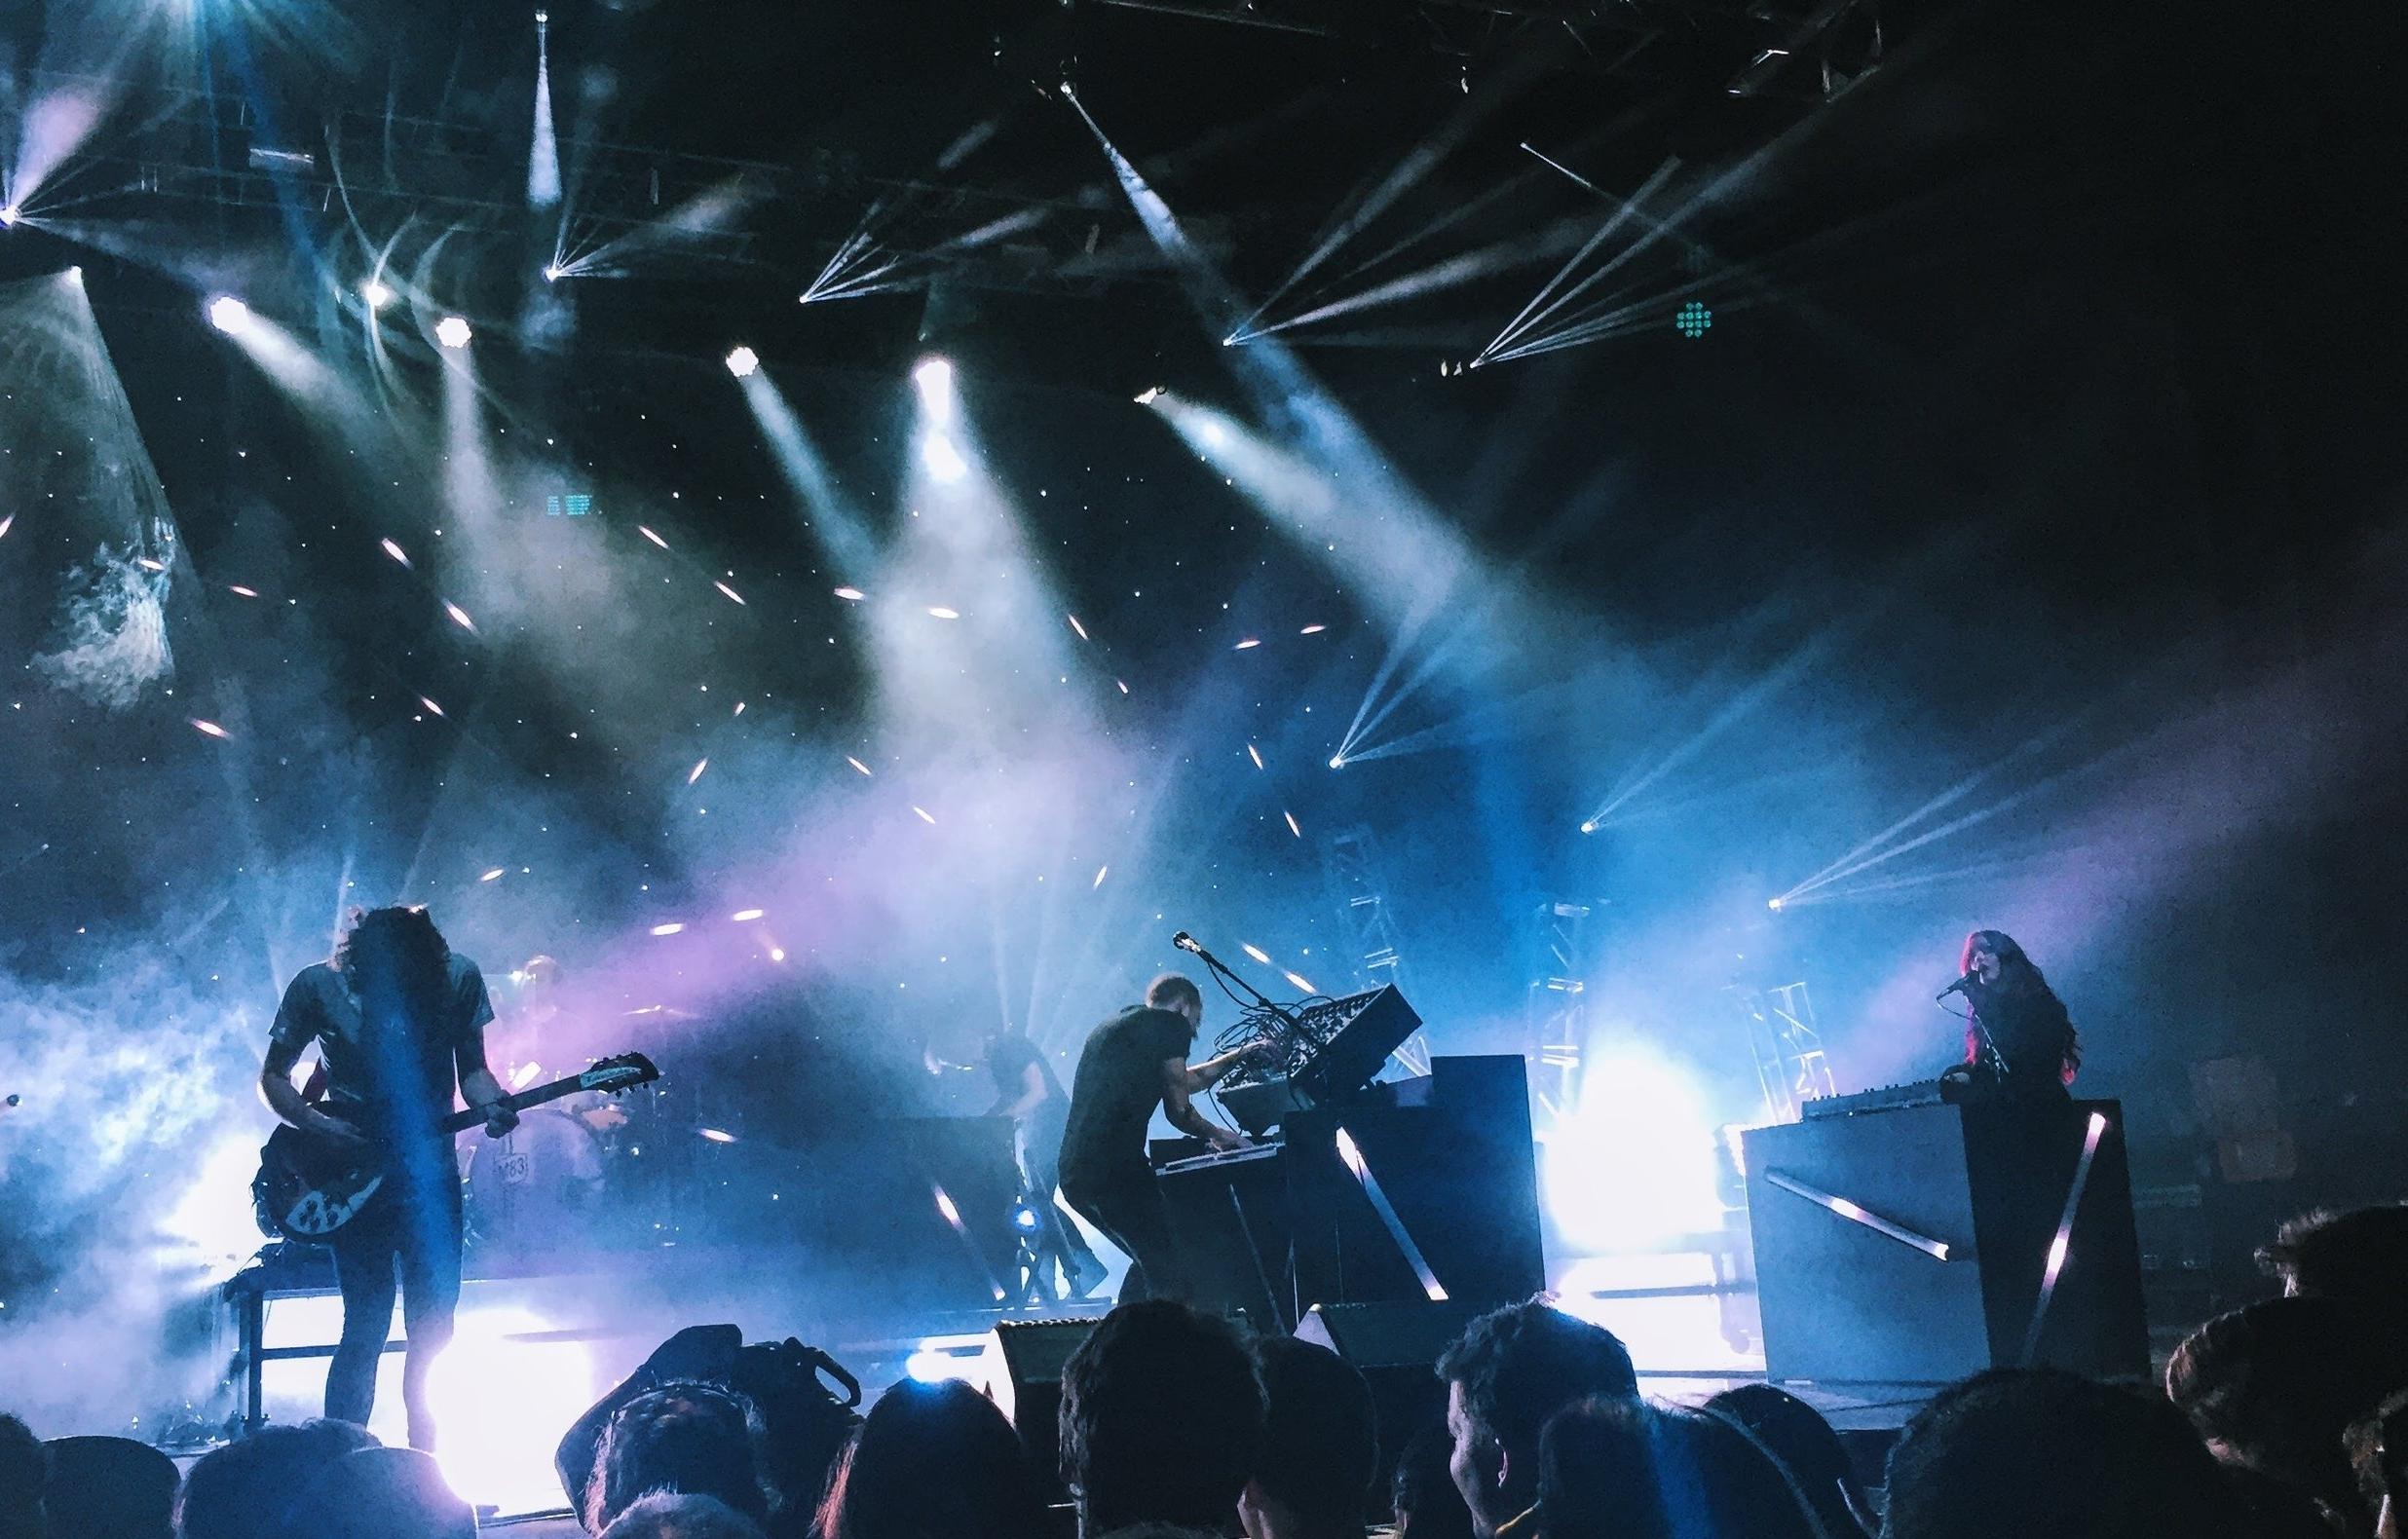 concert blue.jpg